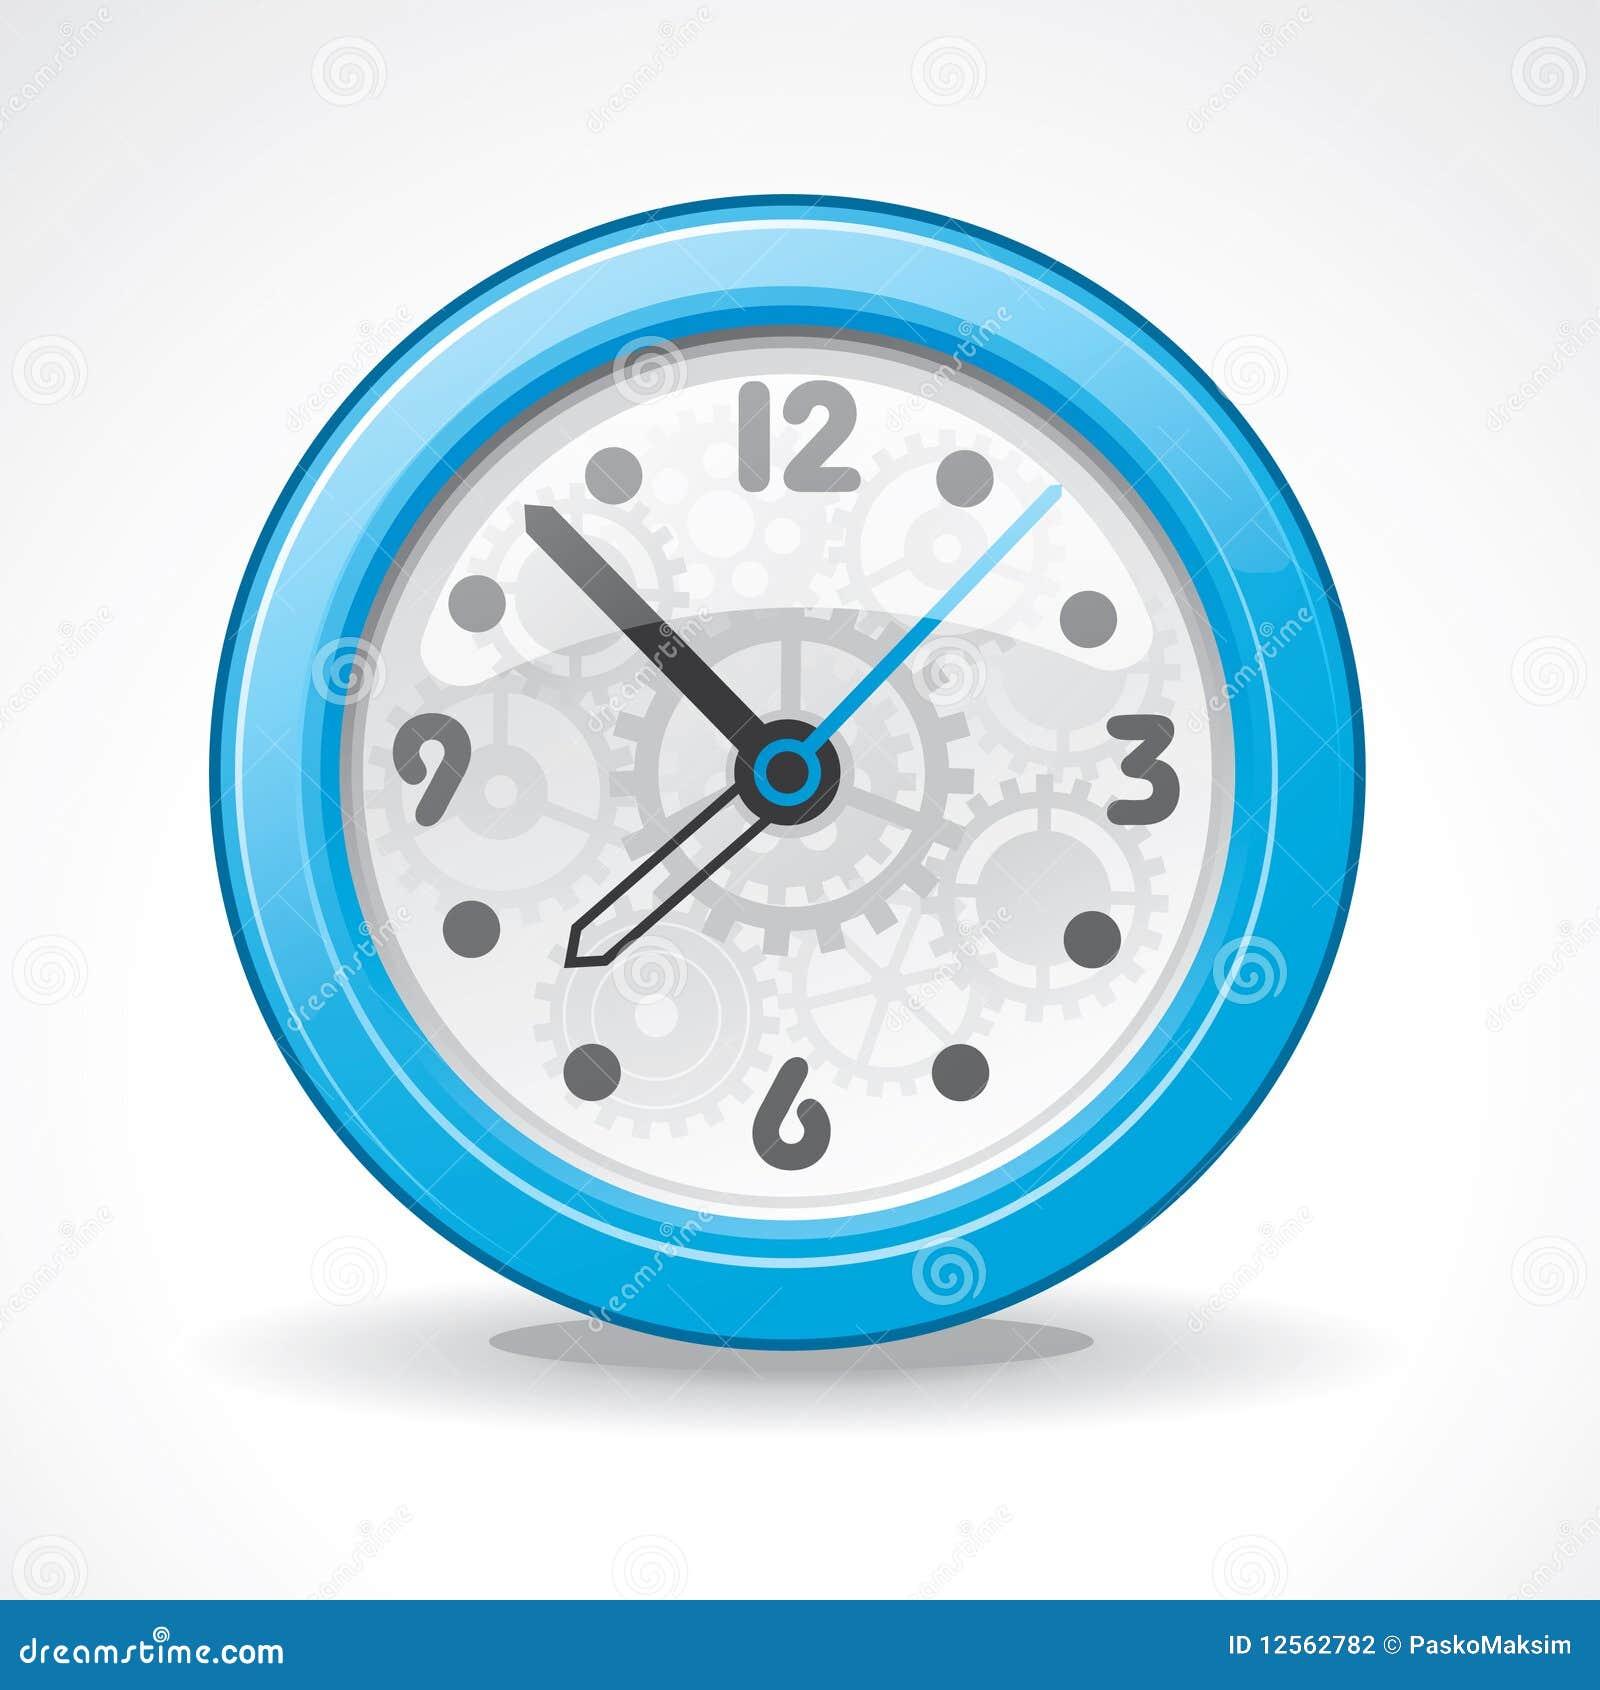 Reloj moderno transparente ilustraci n del vector imagen for Relojes de salon modernos